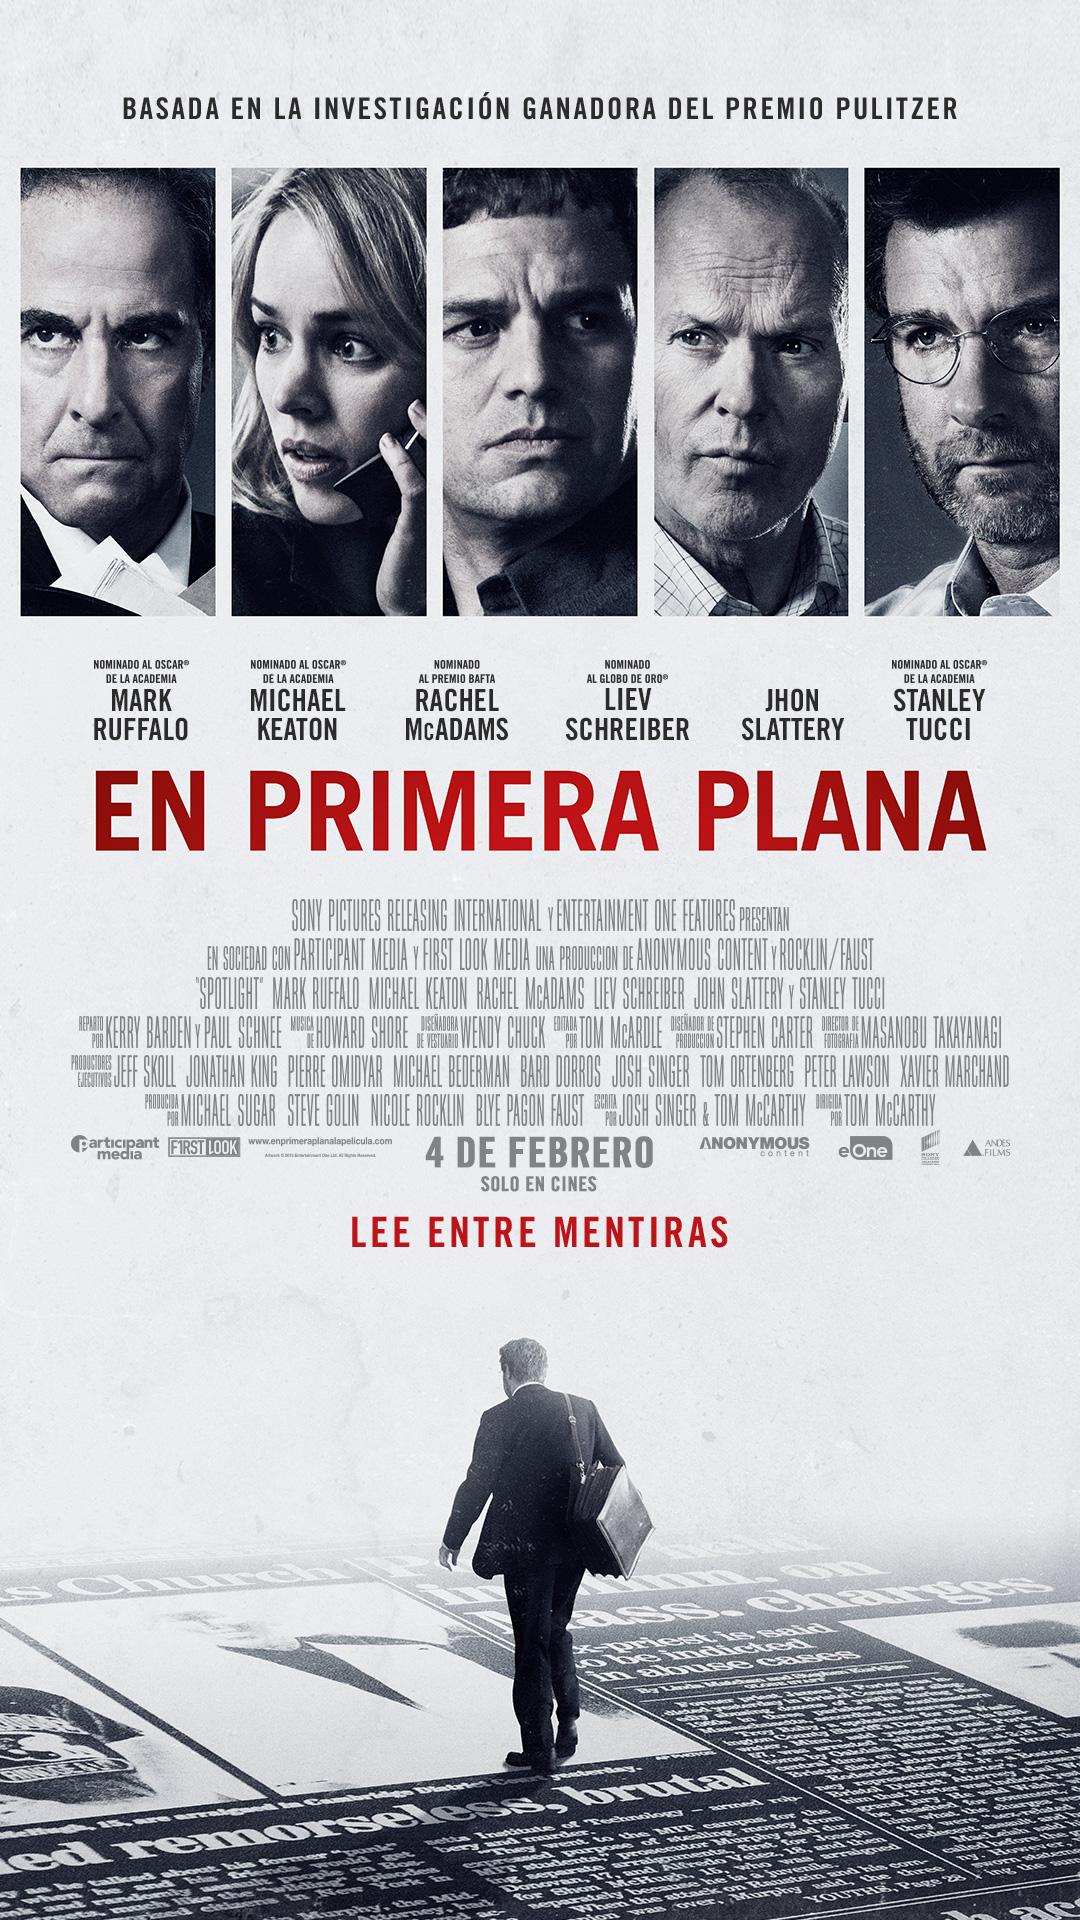 http://www.andesfilms.com.pe/en-primera-plana/